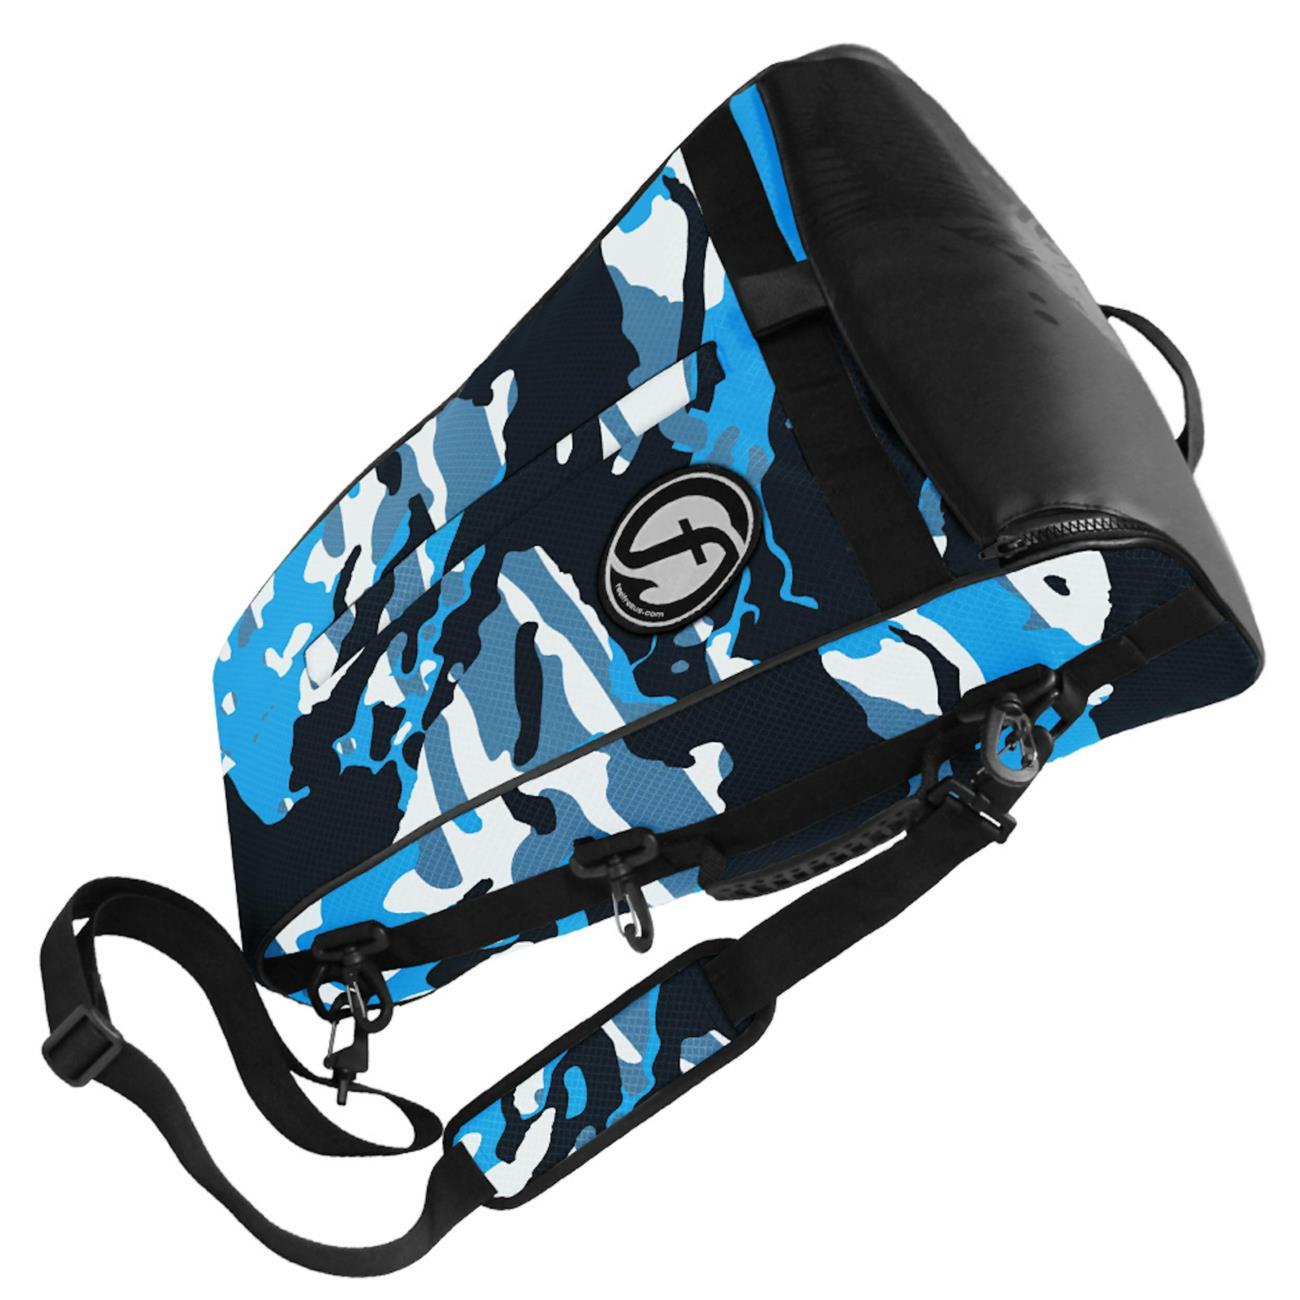 https://feelfreekayak.eu/944-small_default/fish-bag-l-blue-camo.jpg